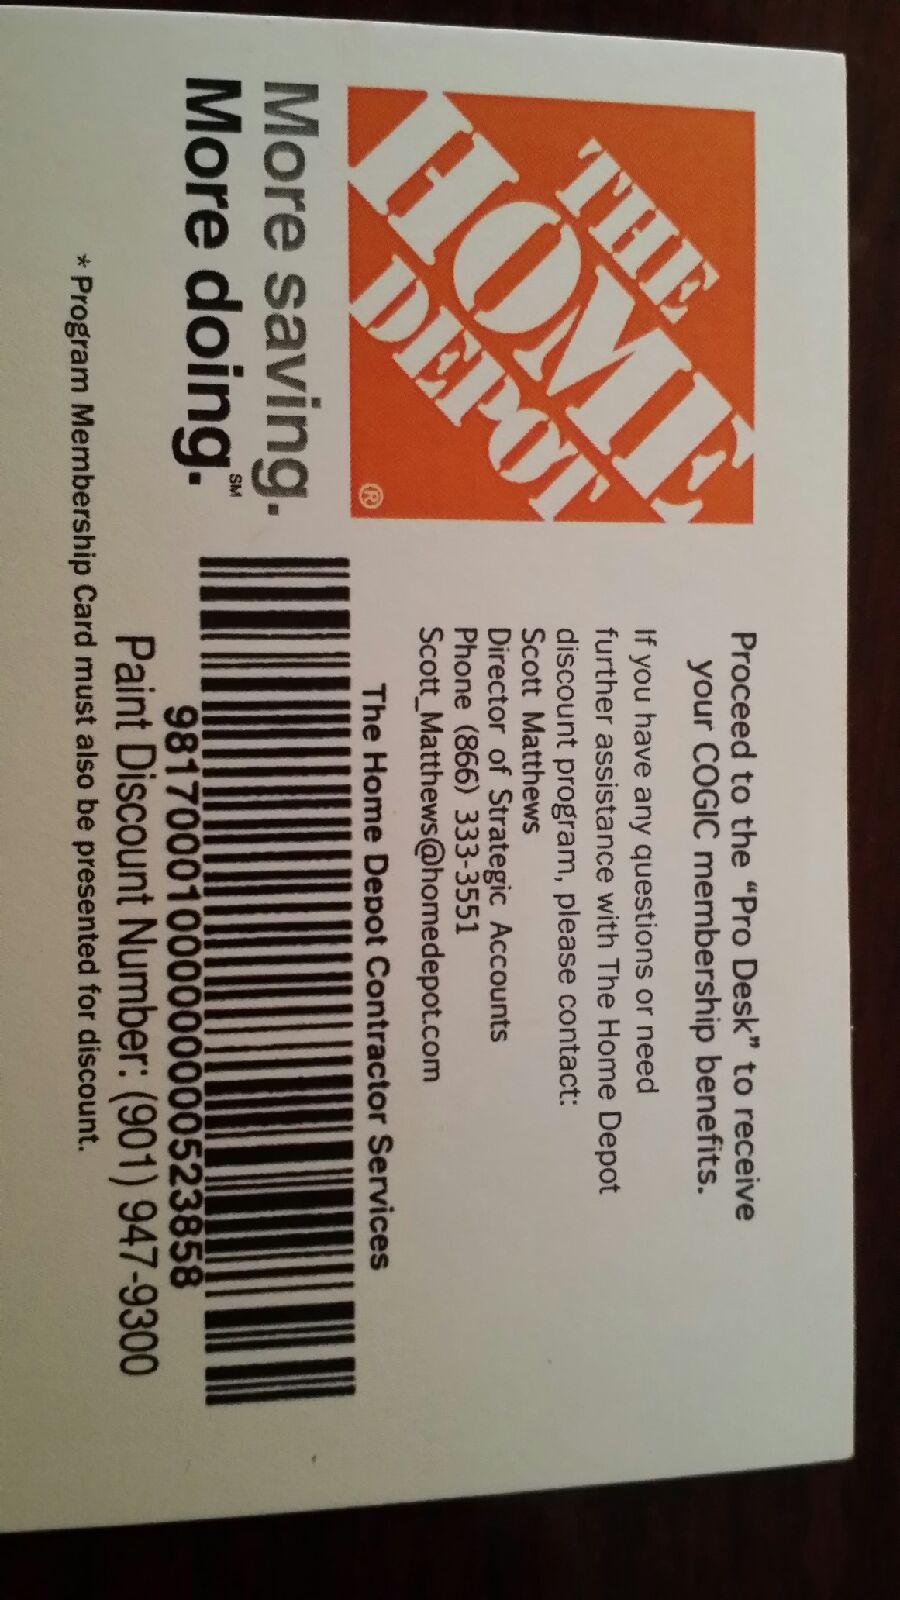 Home Depot COGIC Discount Card